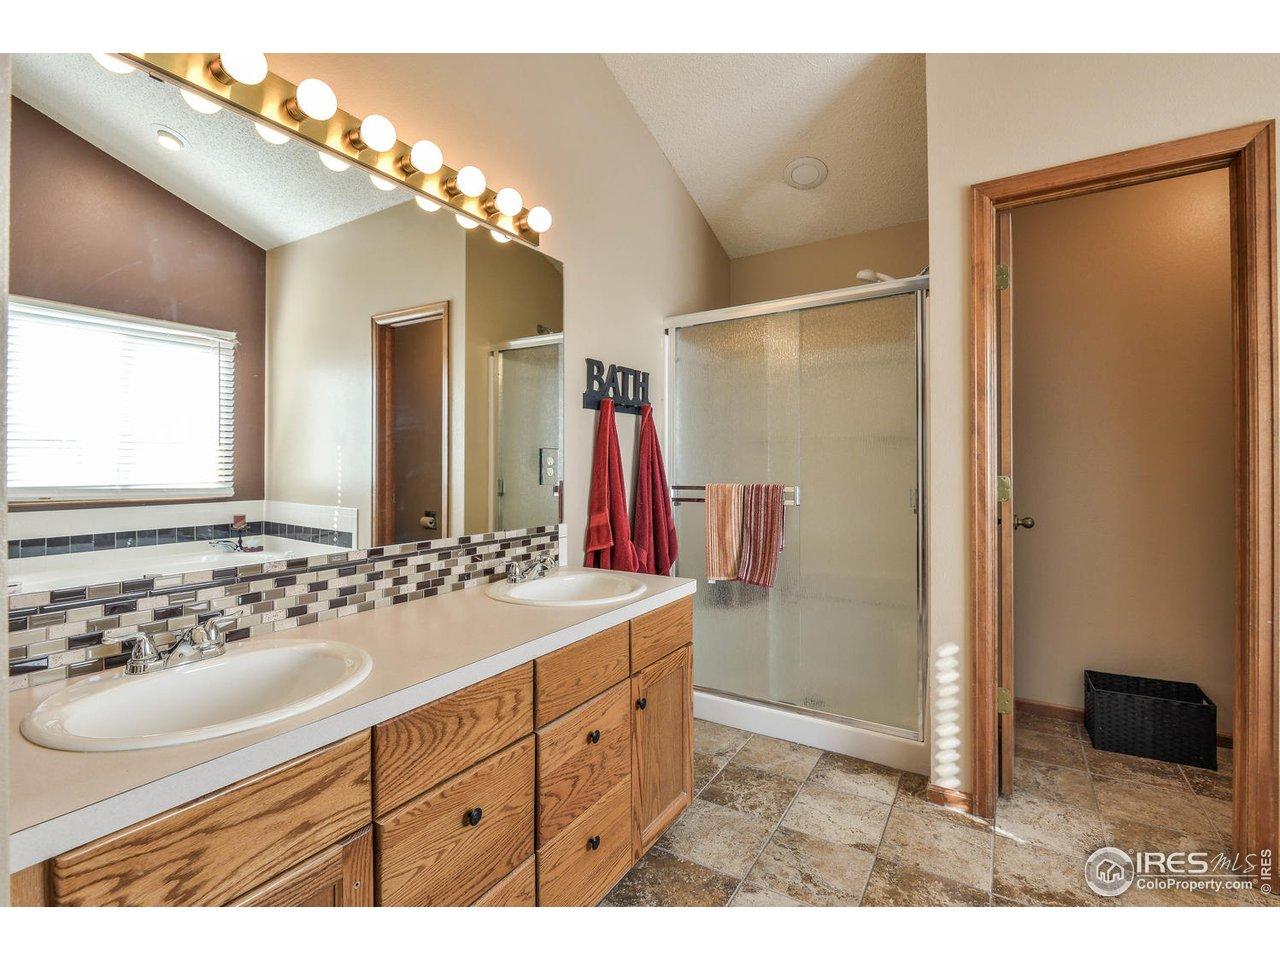 5-Piece Tile Master Bath